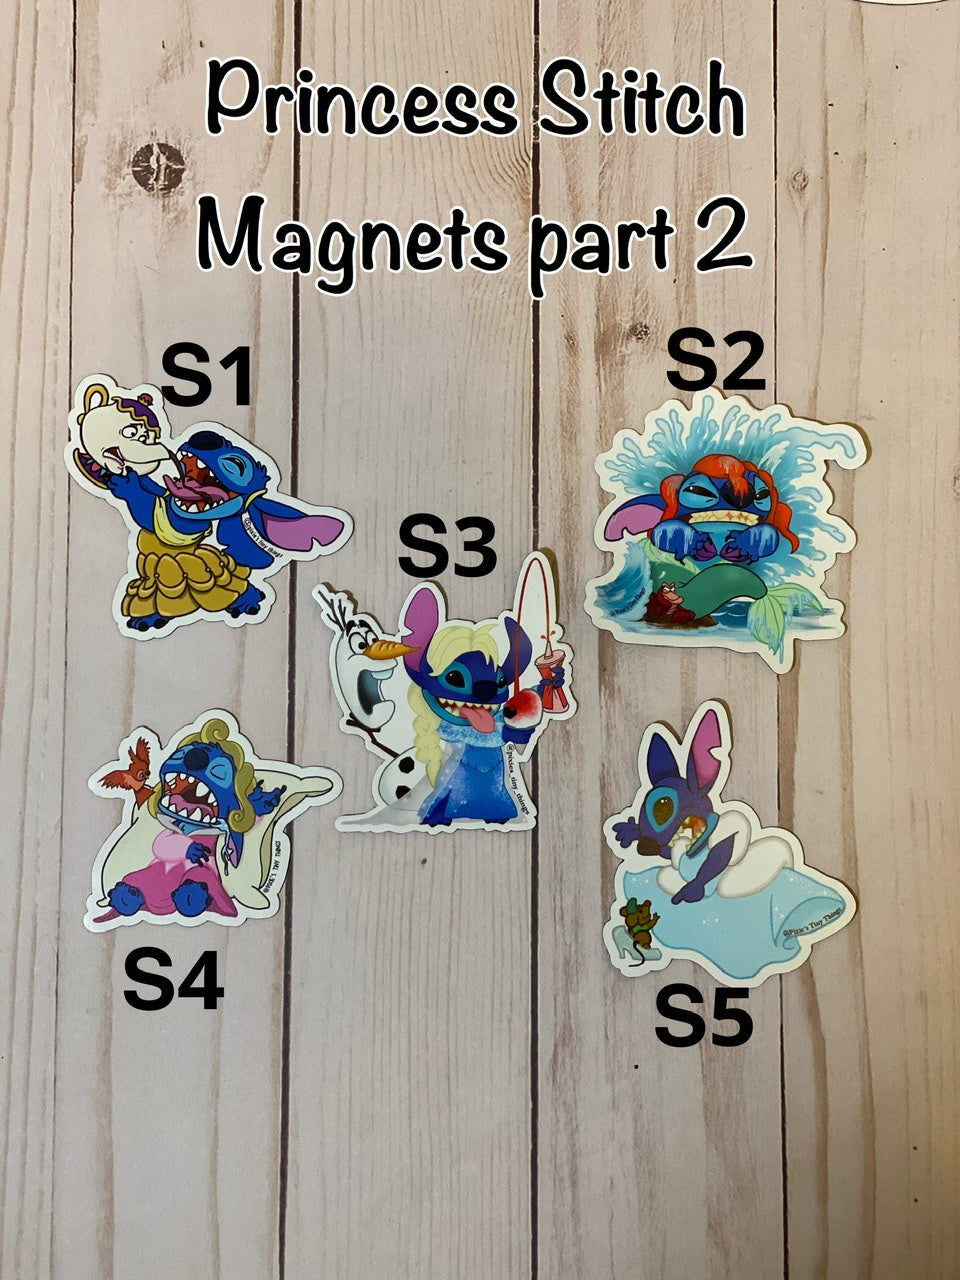 Princess Stitch Magnets